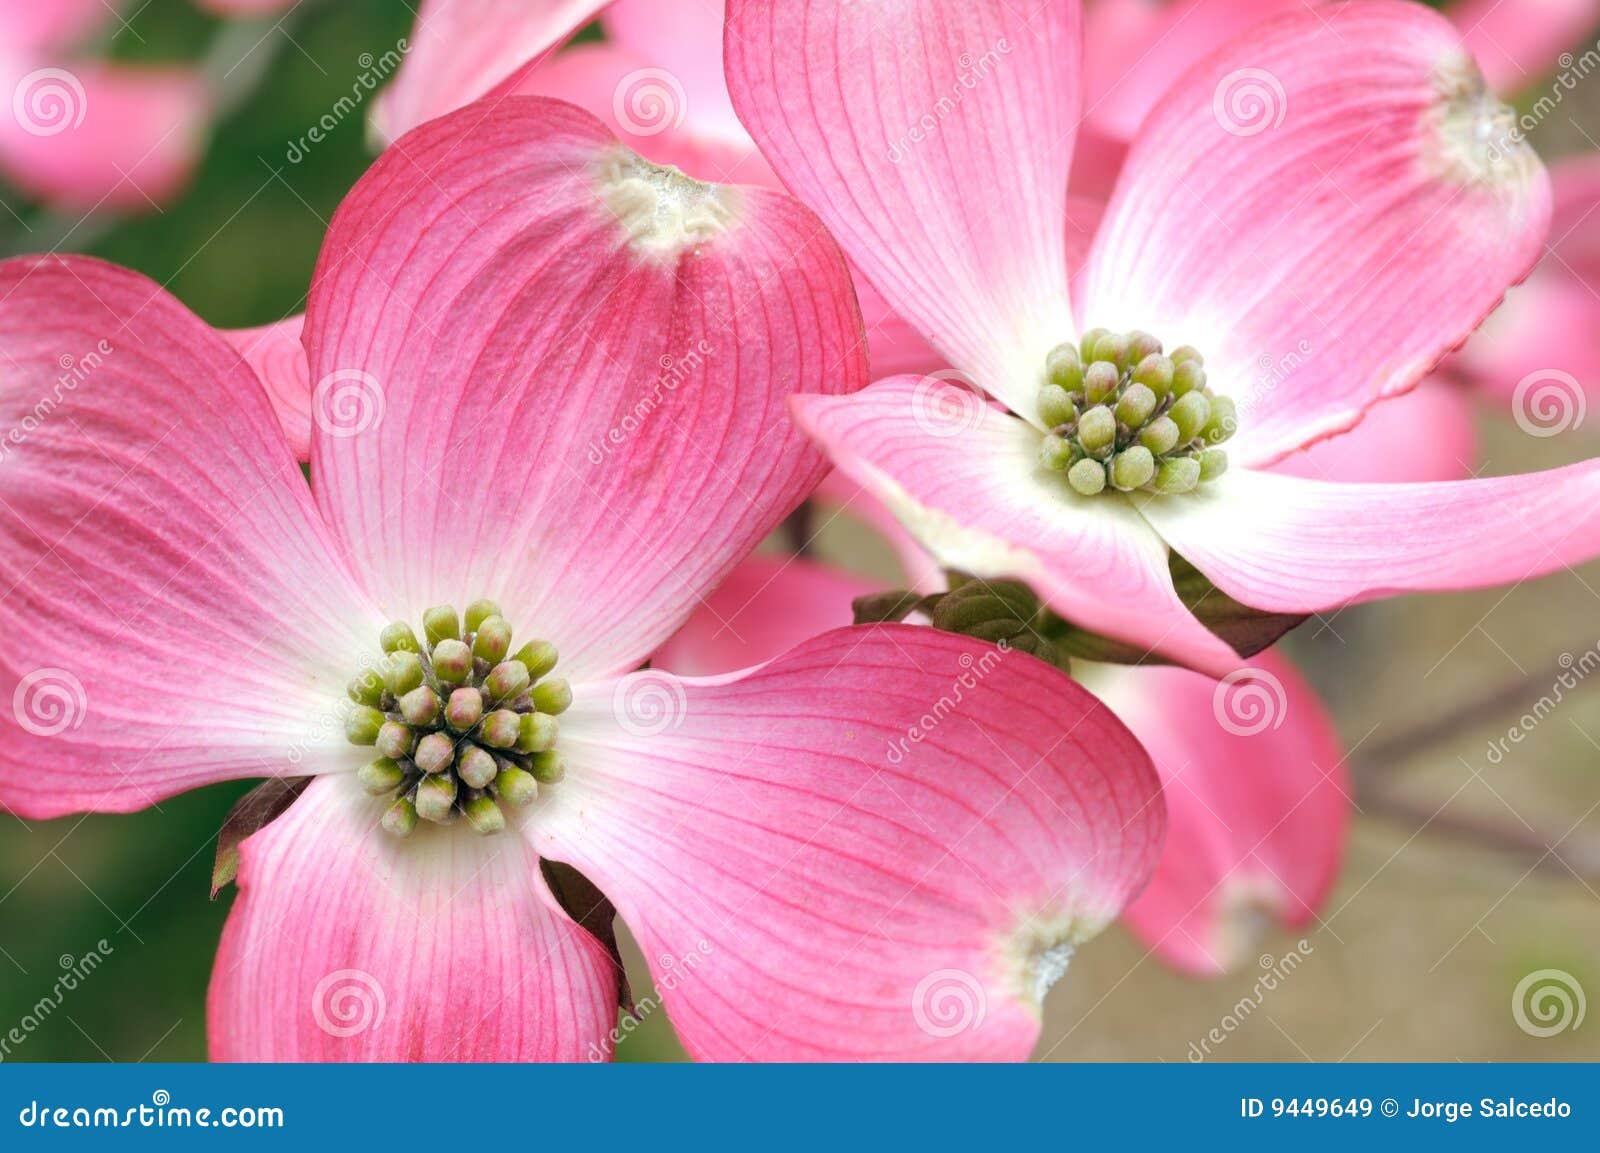 Pink Flowering Dogwood Stock Image Image Of Nobody Pattern 9449649